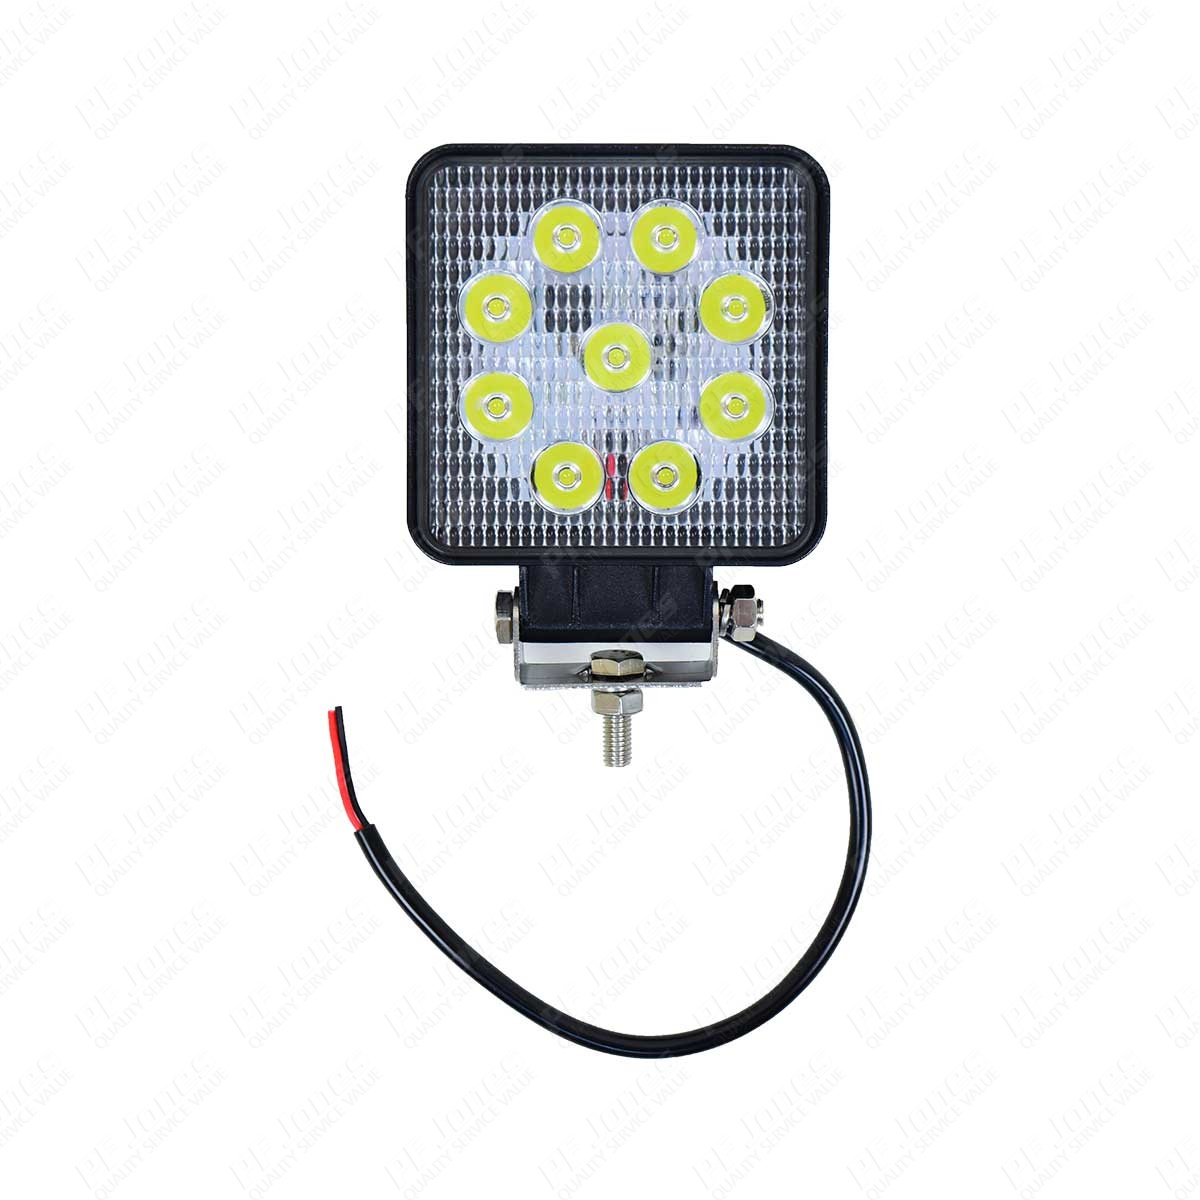 Worklamp for voltages ranging from 10V to 30V